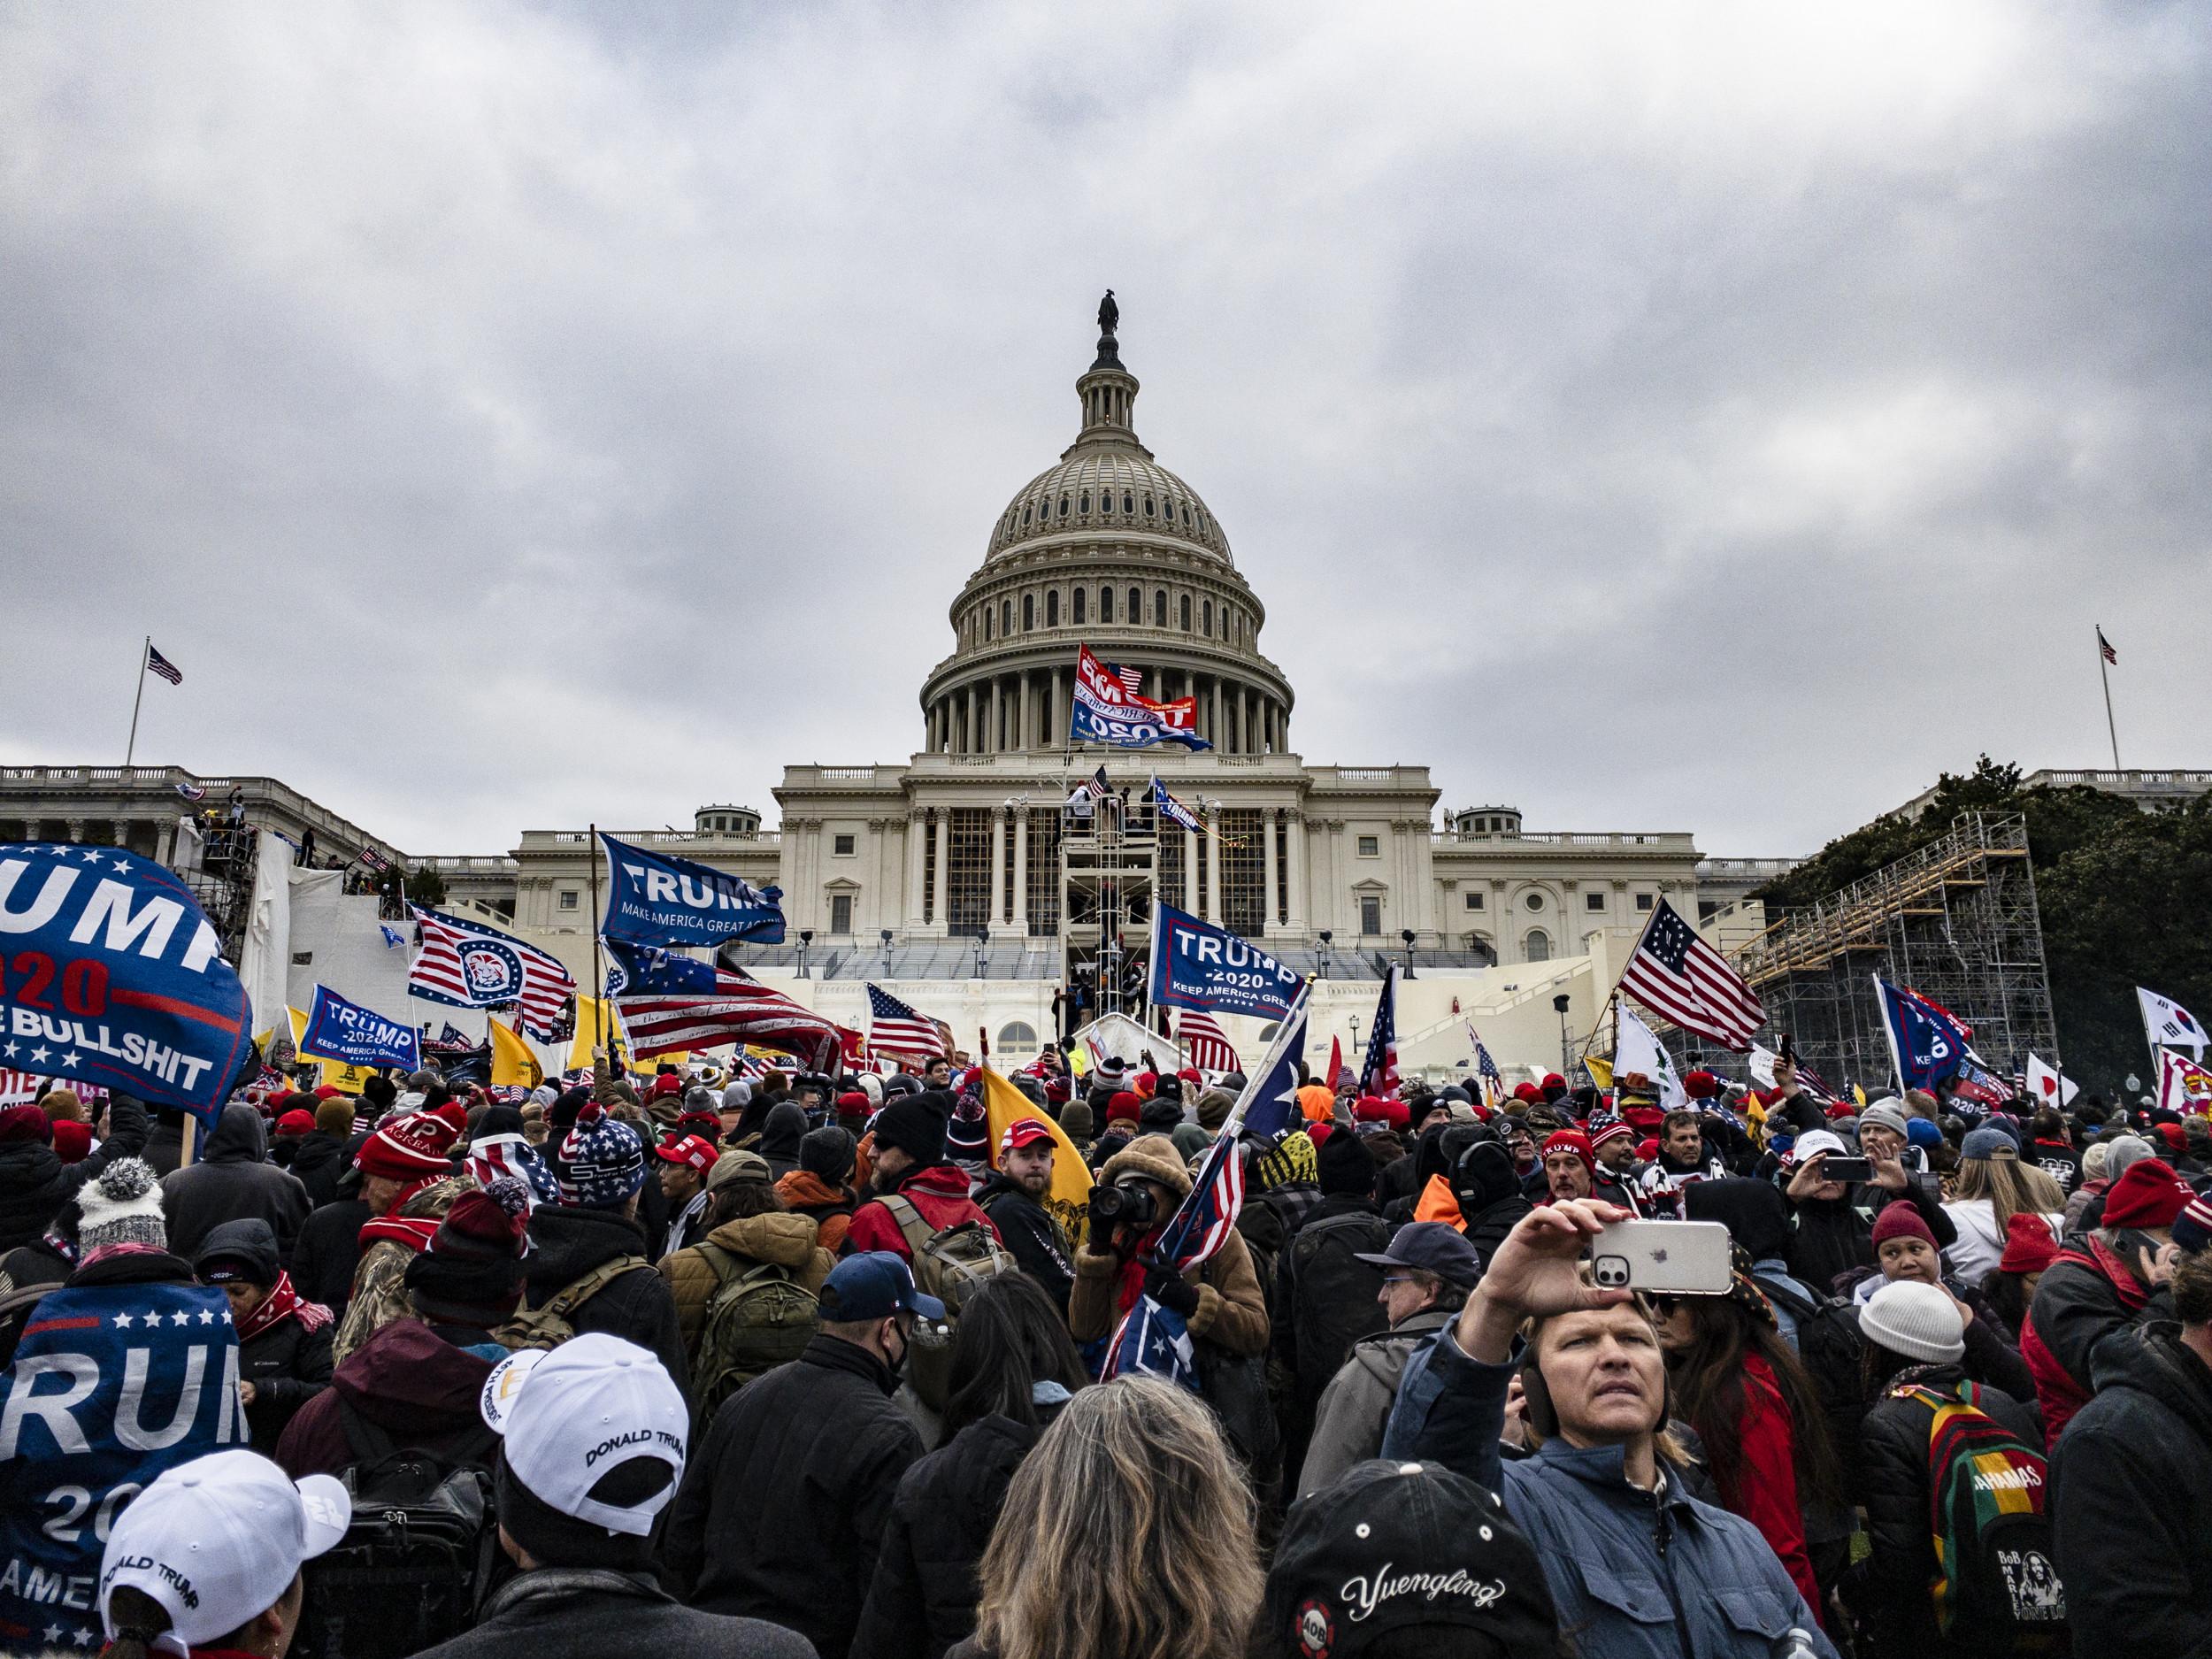 Capitol Police Chief Calls January 6 Riot a 'Terrorist Attack'